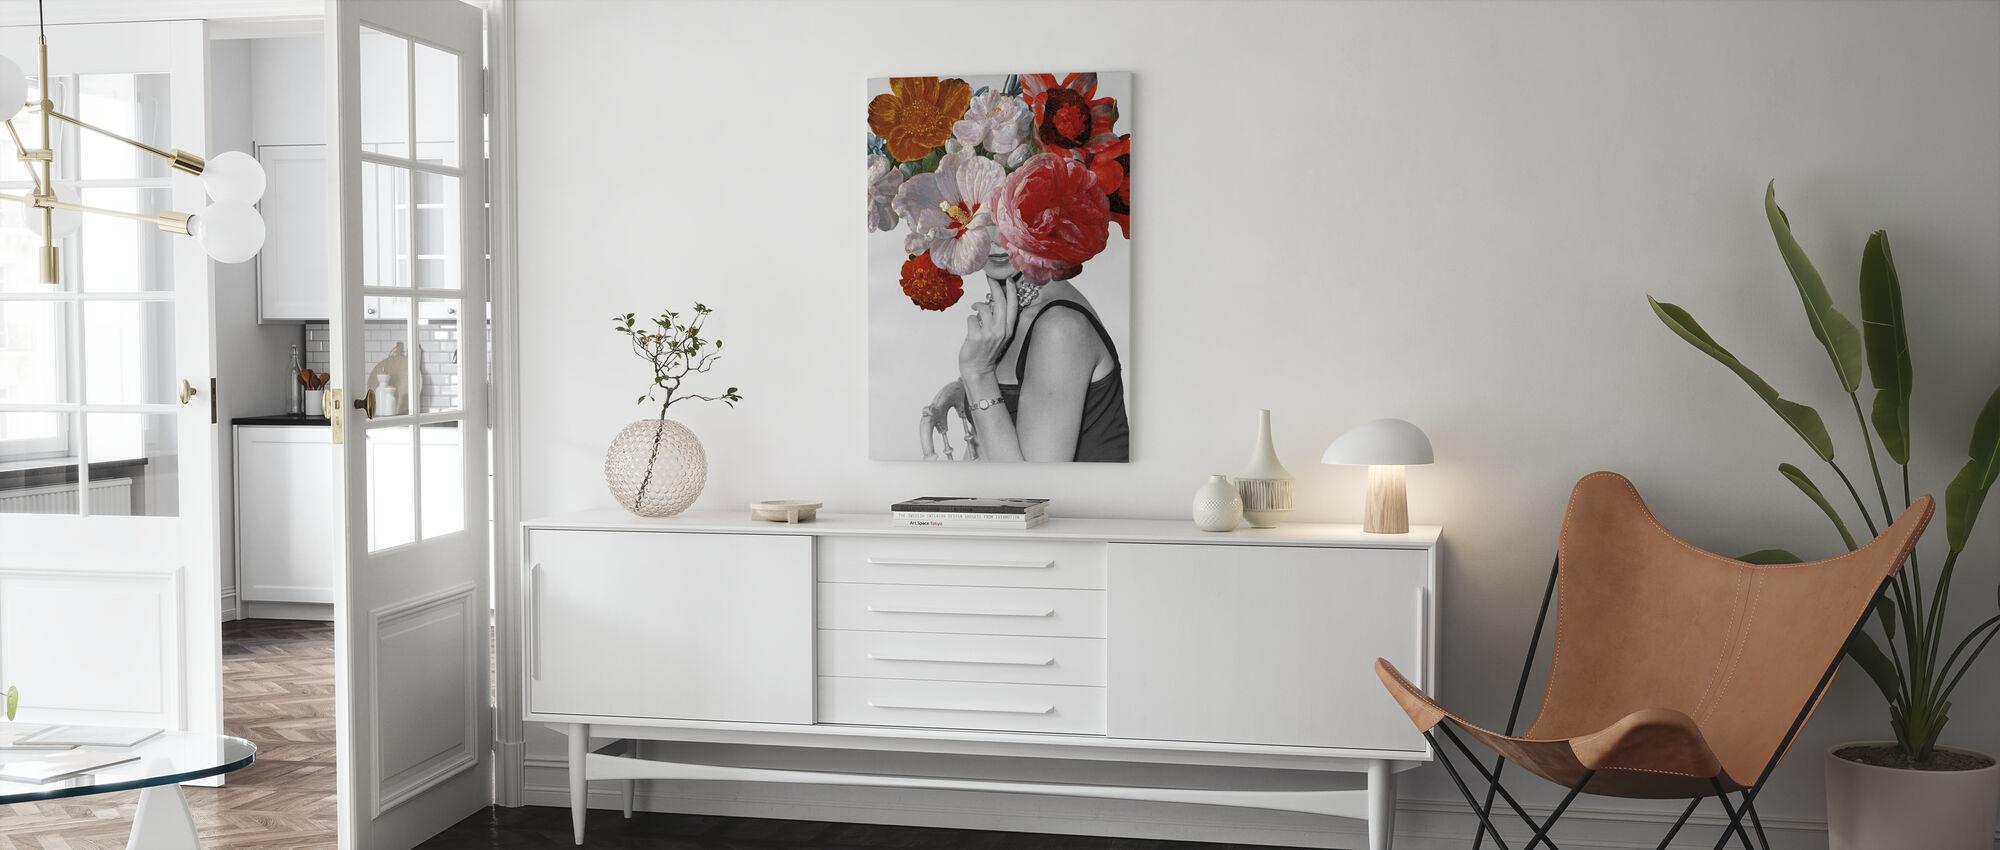 Tuinpartij II - Canvas print - Woonkamer